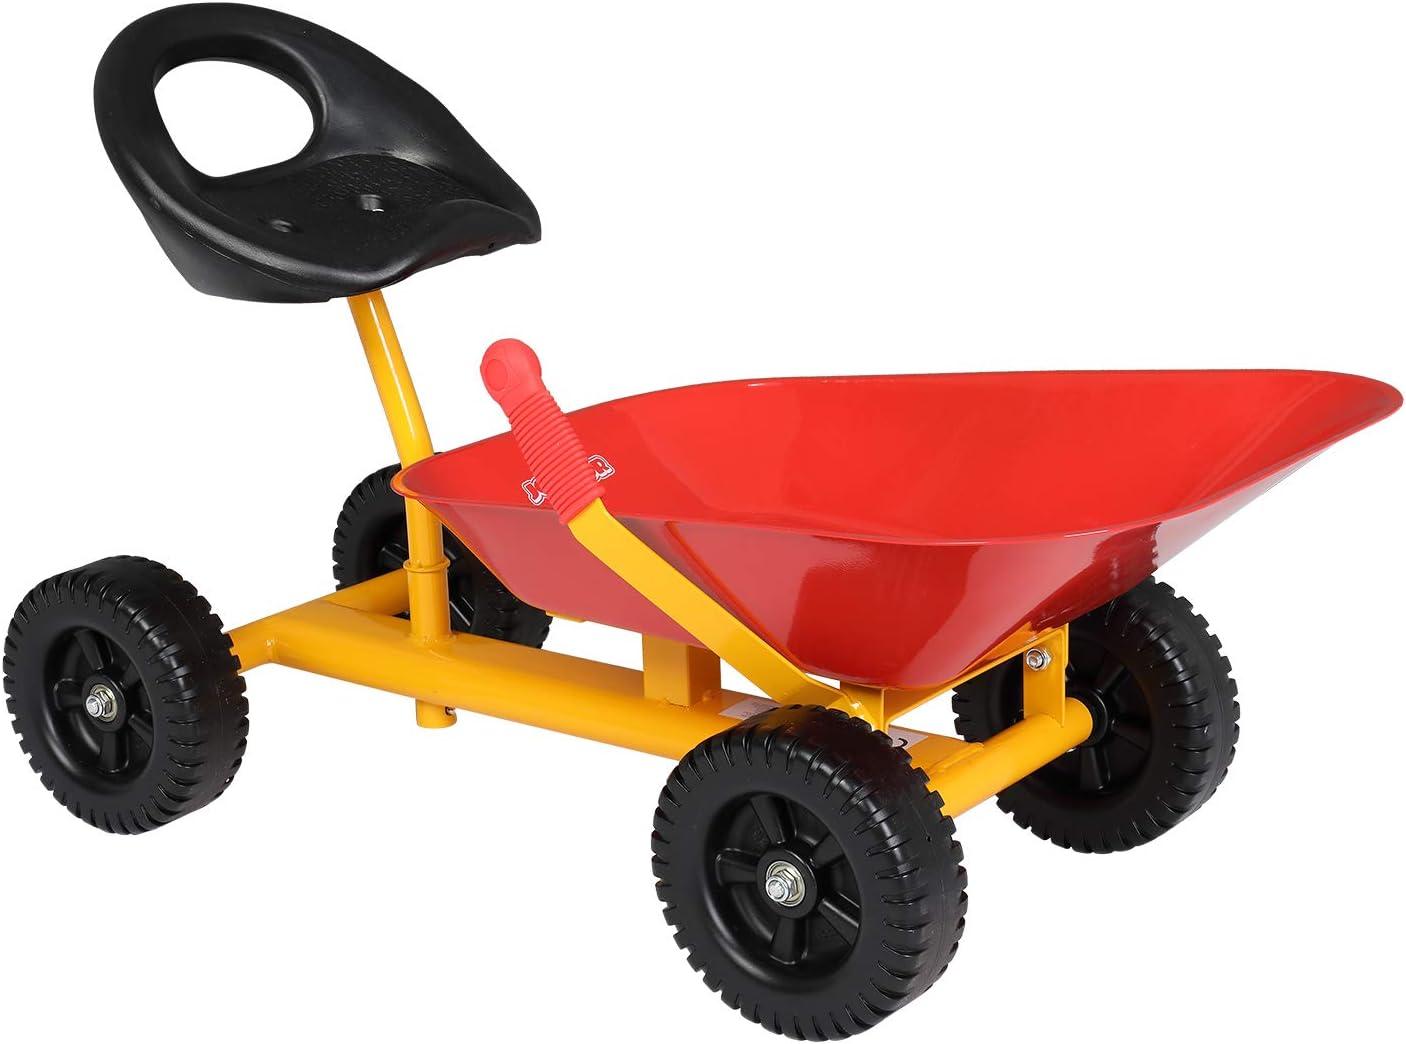 JOYMOR Kids Ranking TOP12 Ride on Sand Max 40% OFF Dumper with Sandbox Toy Wheels Outdoor